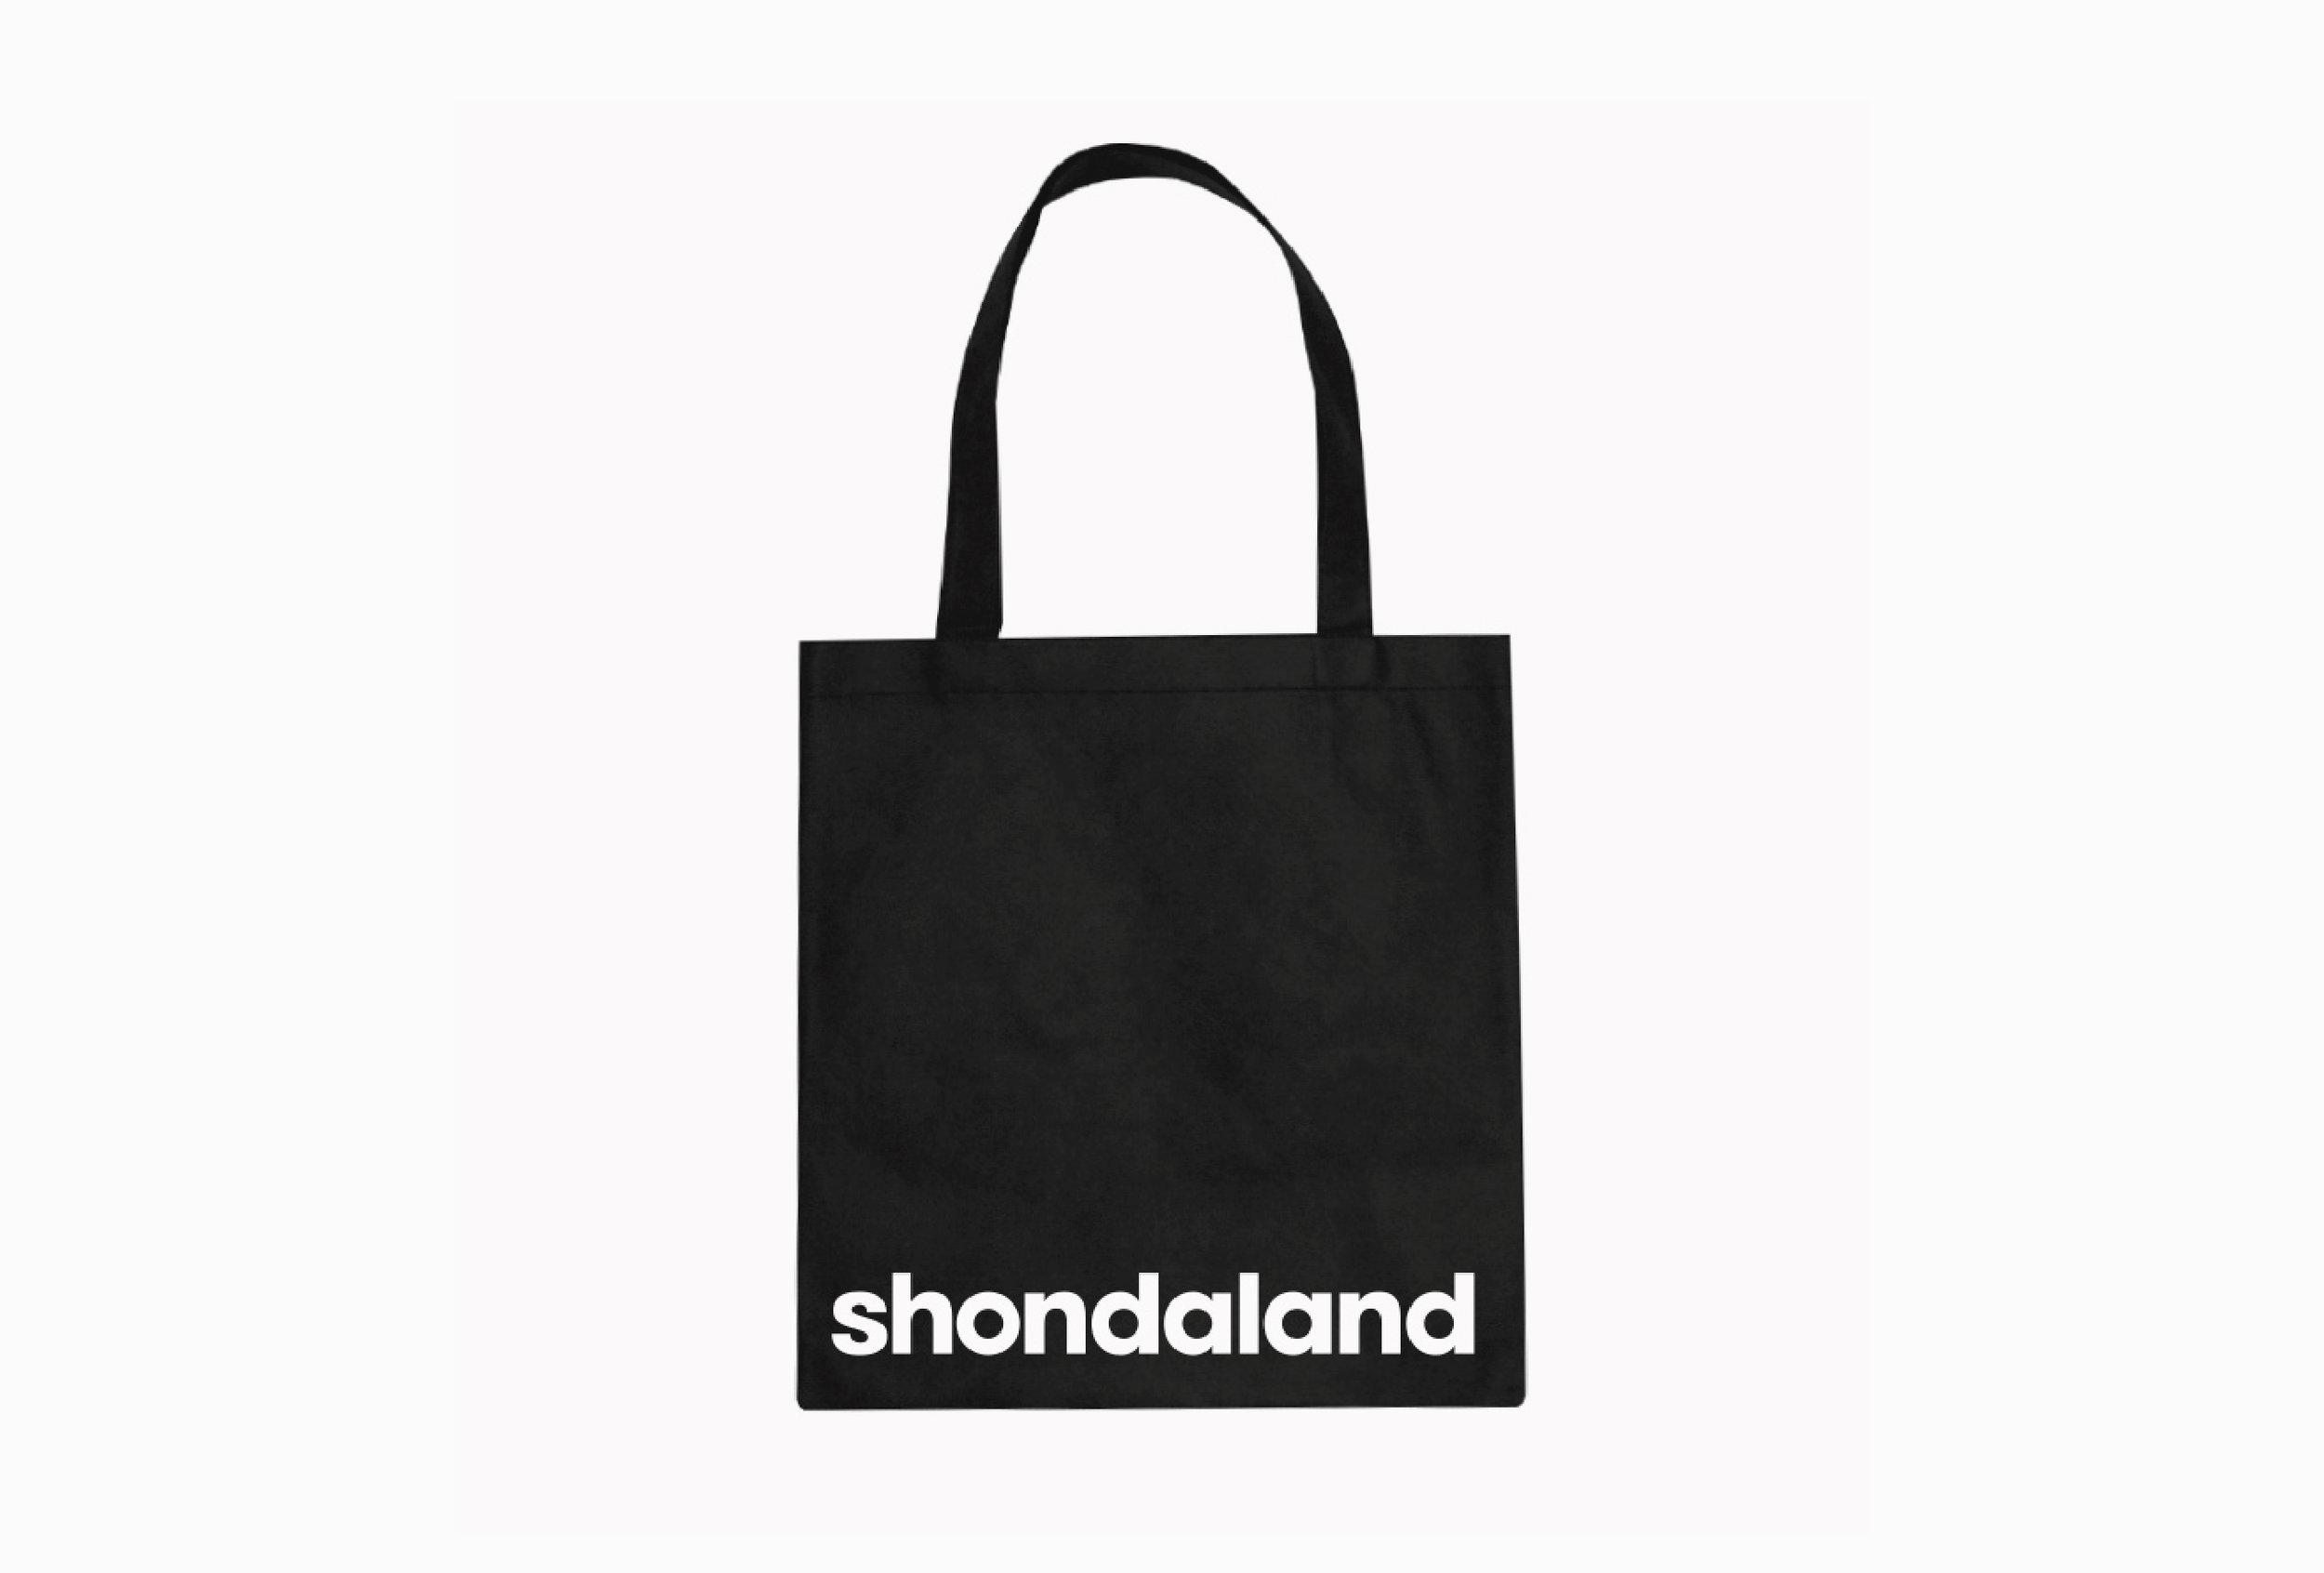 Shondaland_website_aptone_NEW-11.jpg